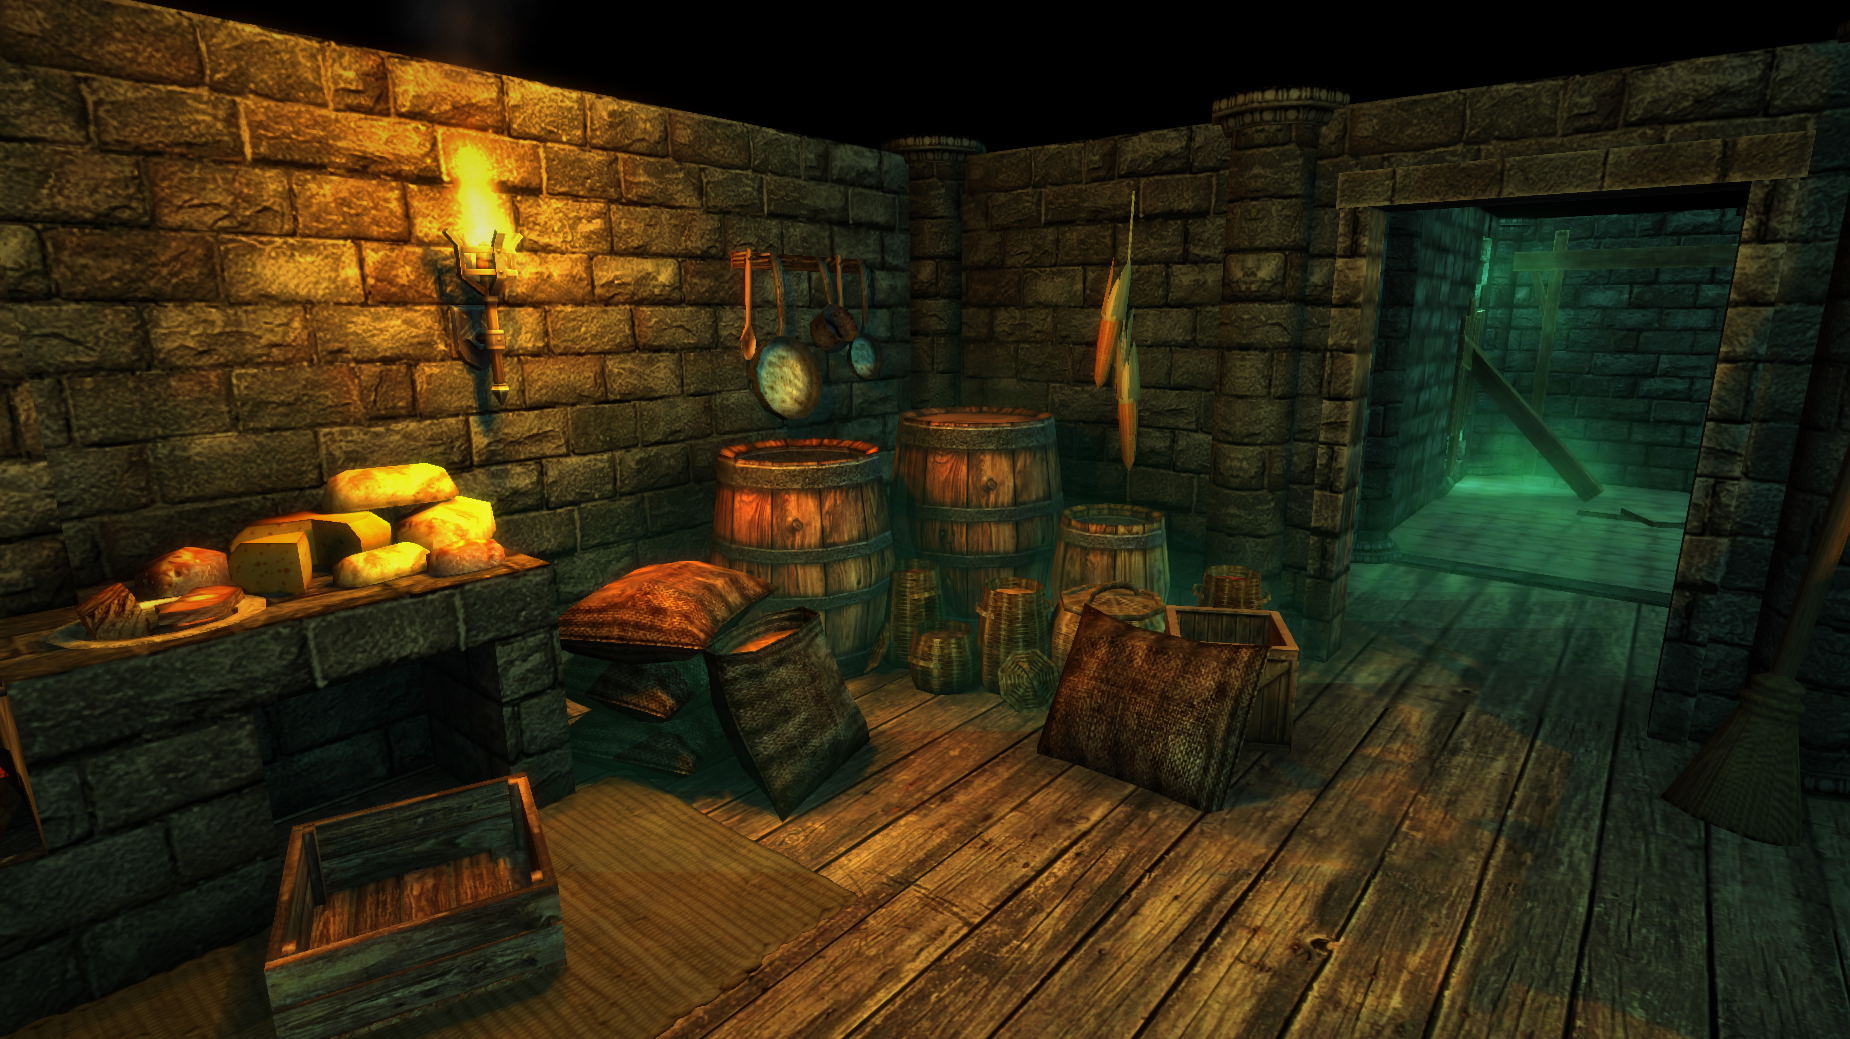 kitchen game exit to cellar